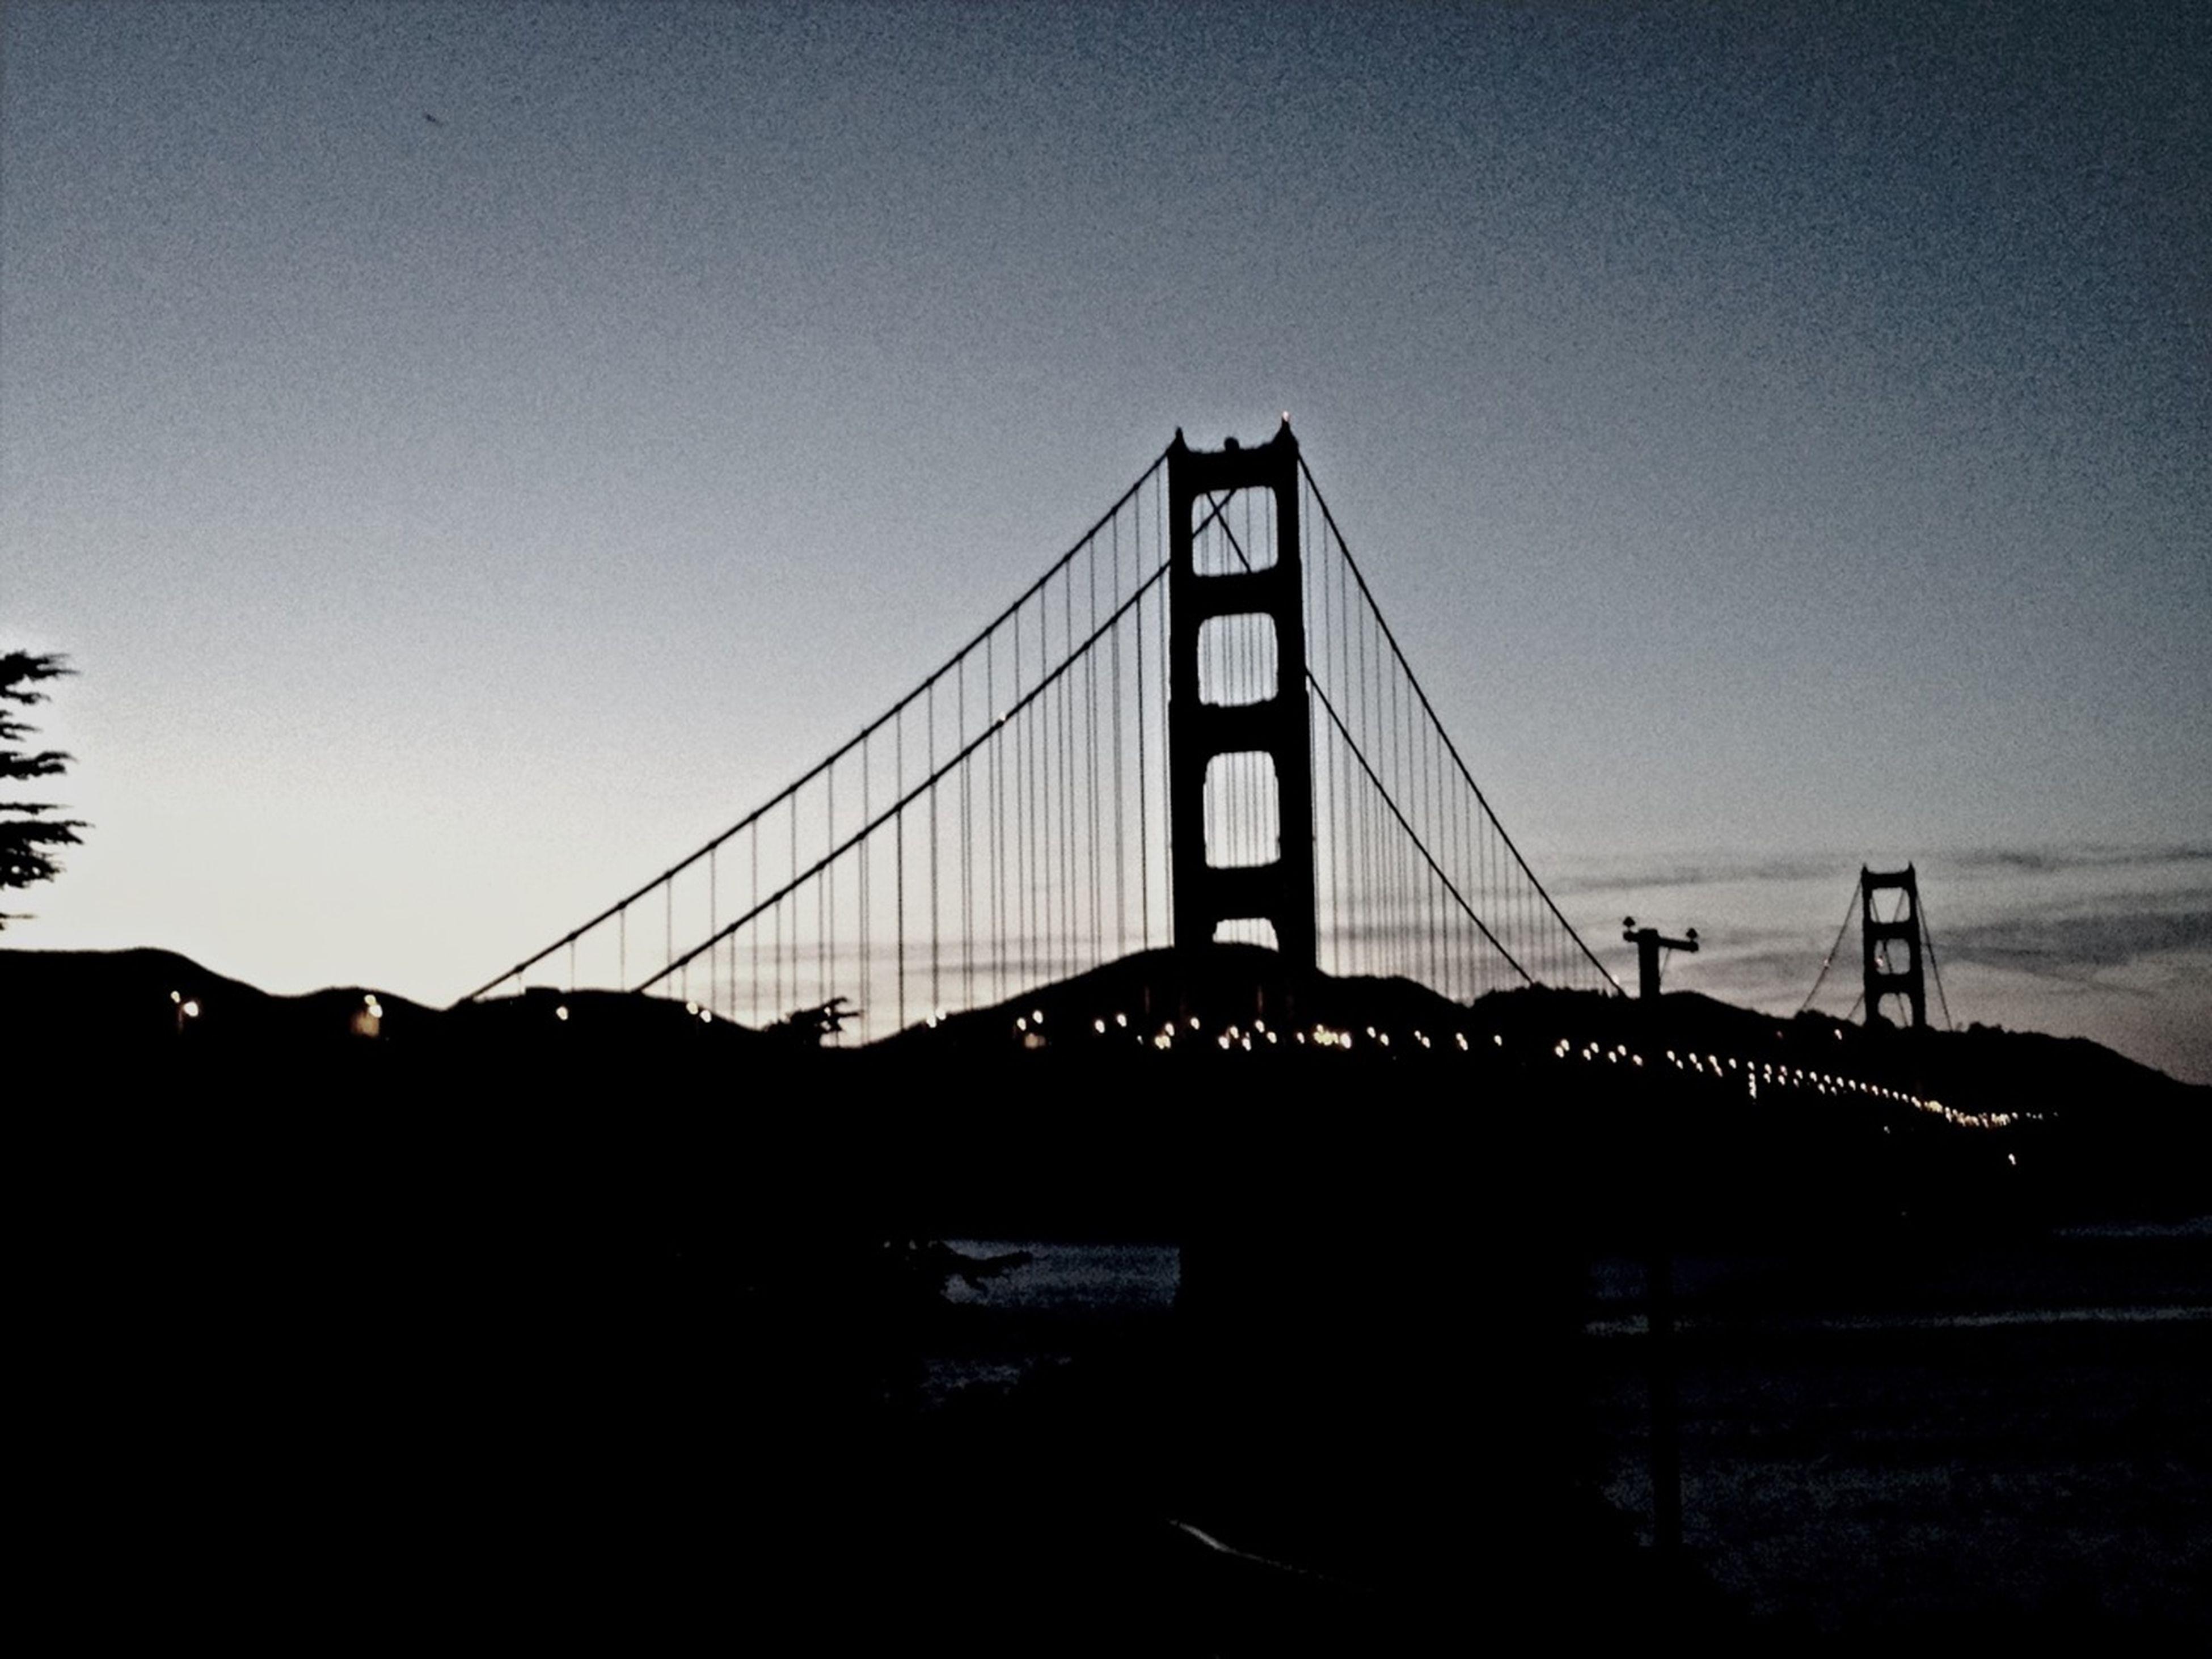 Just Another Bridge